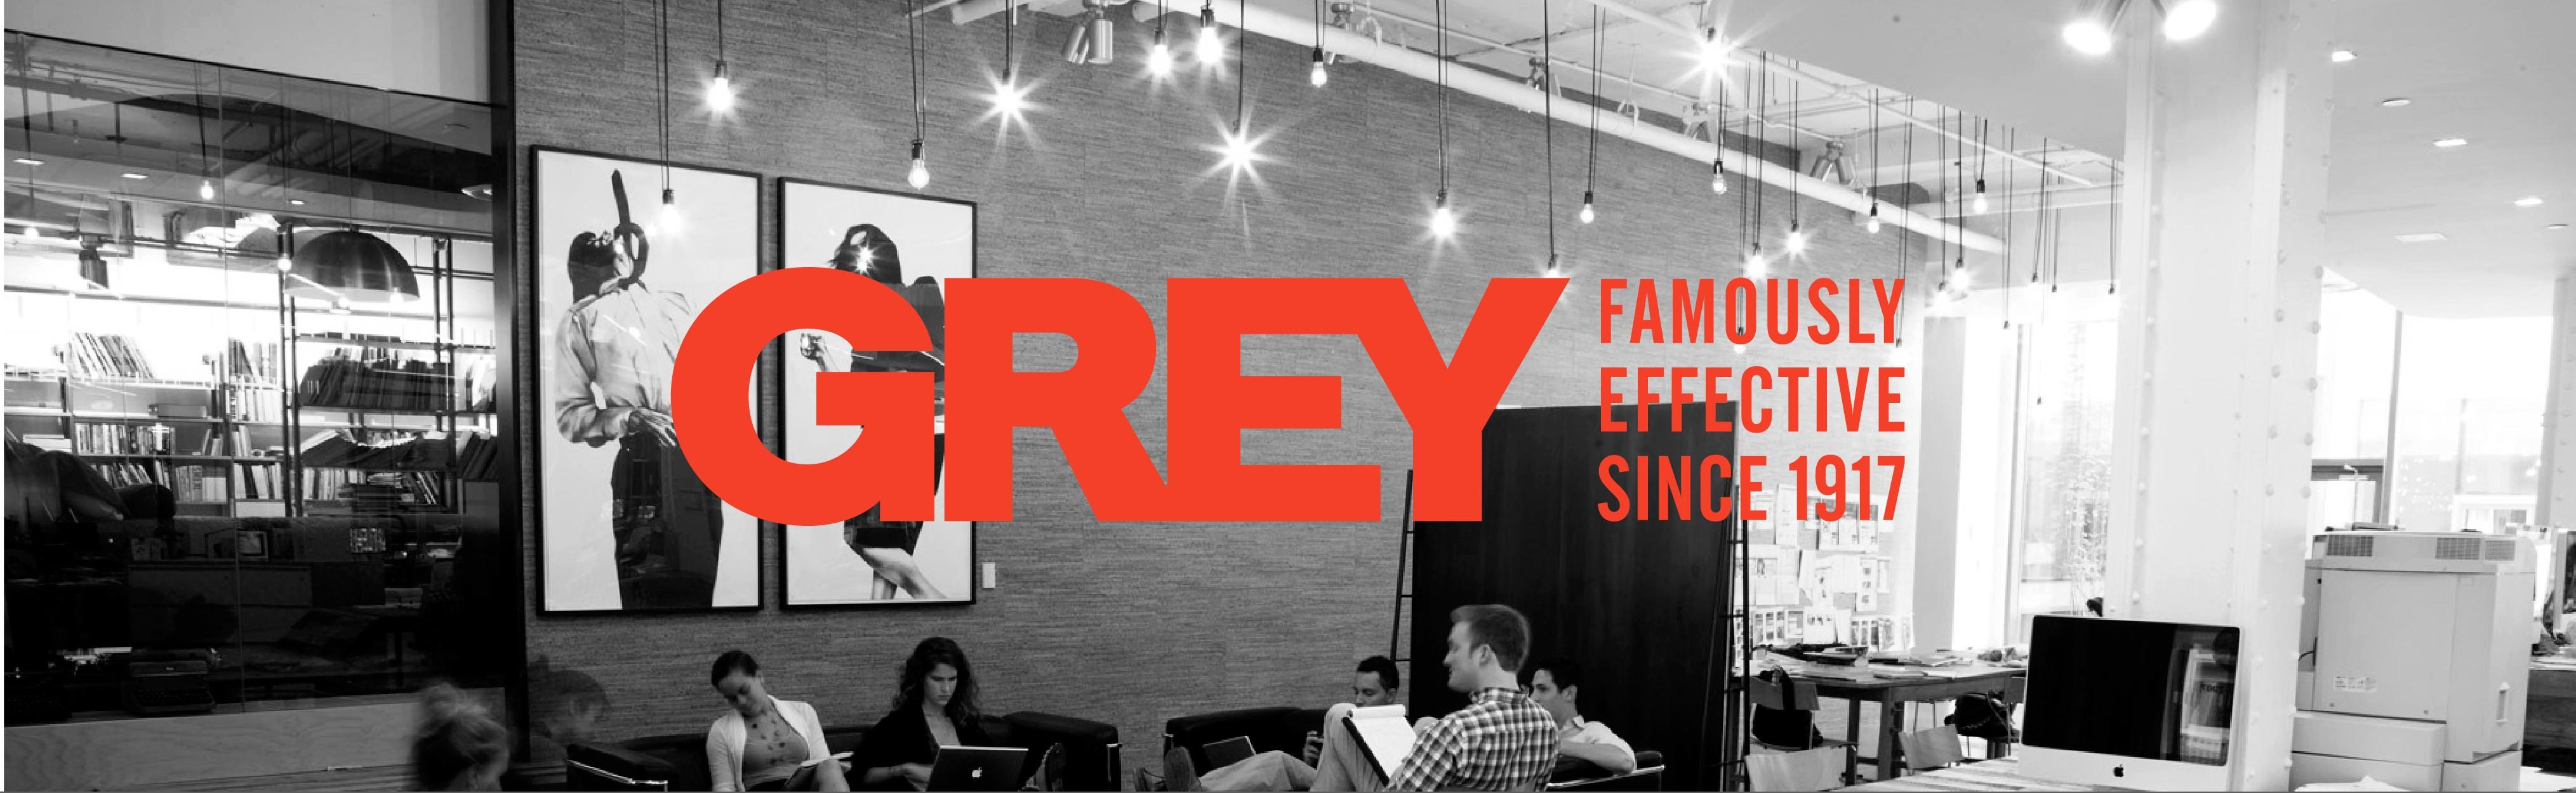 grey advertising